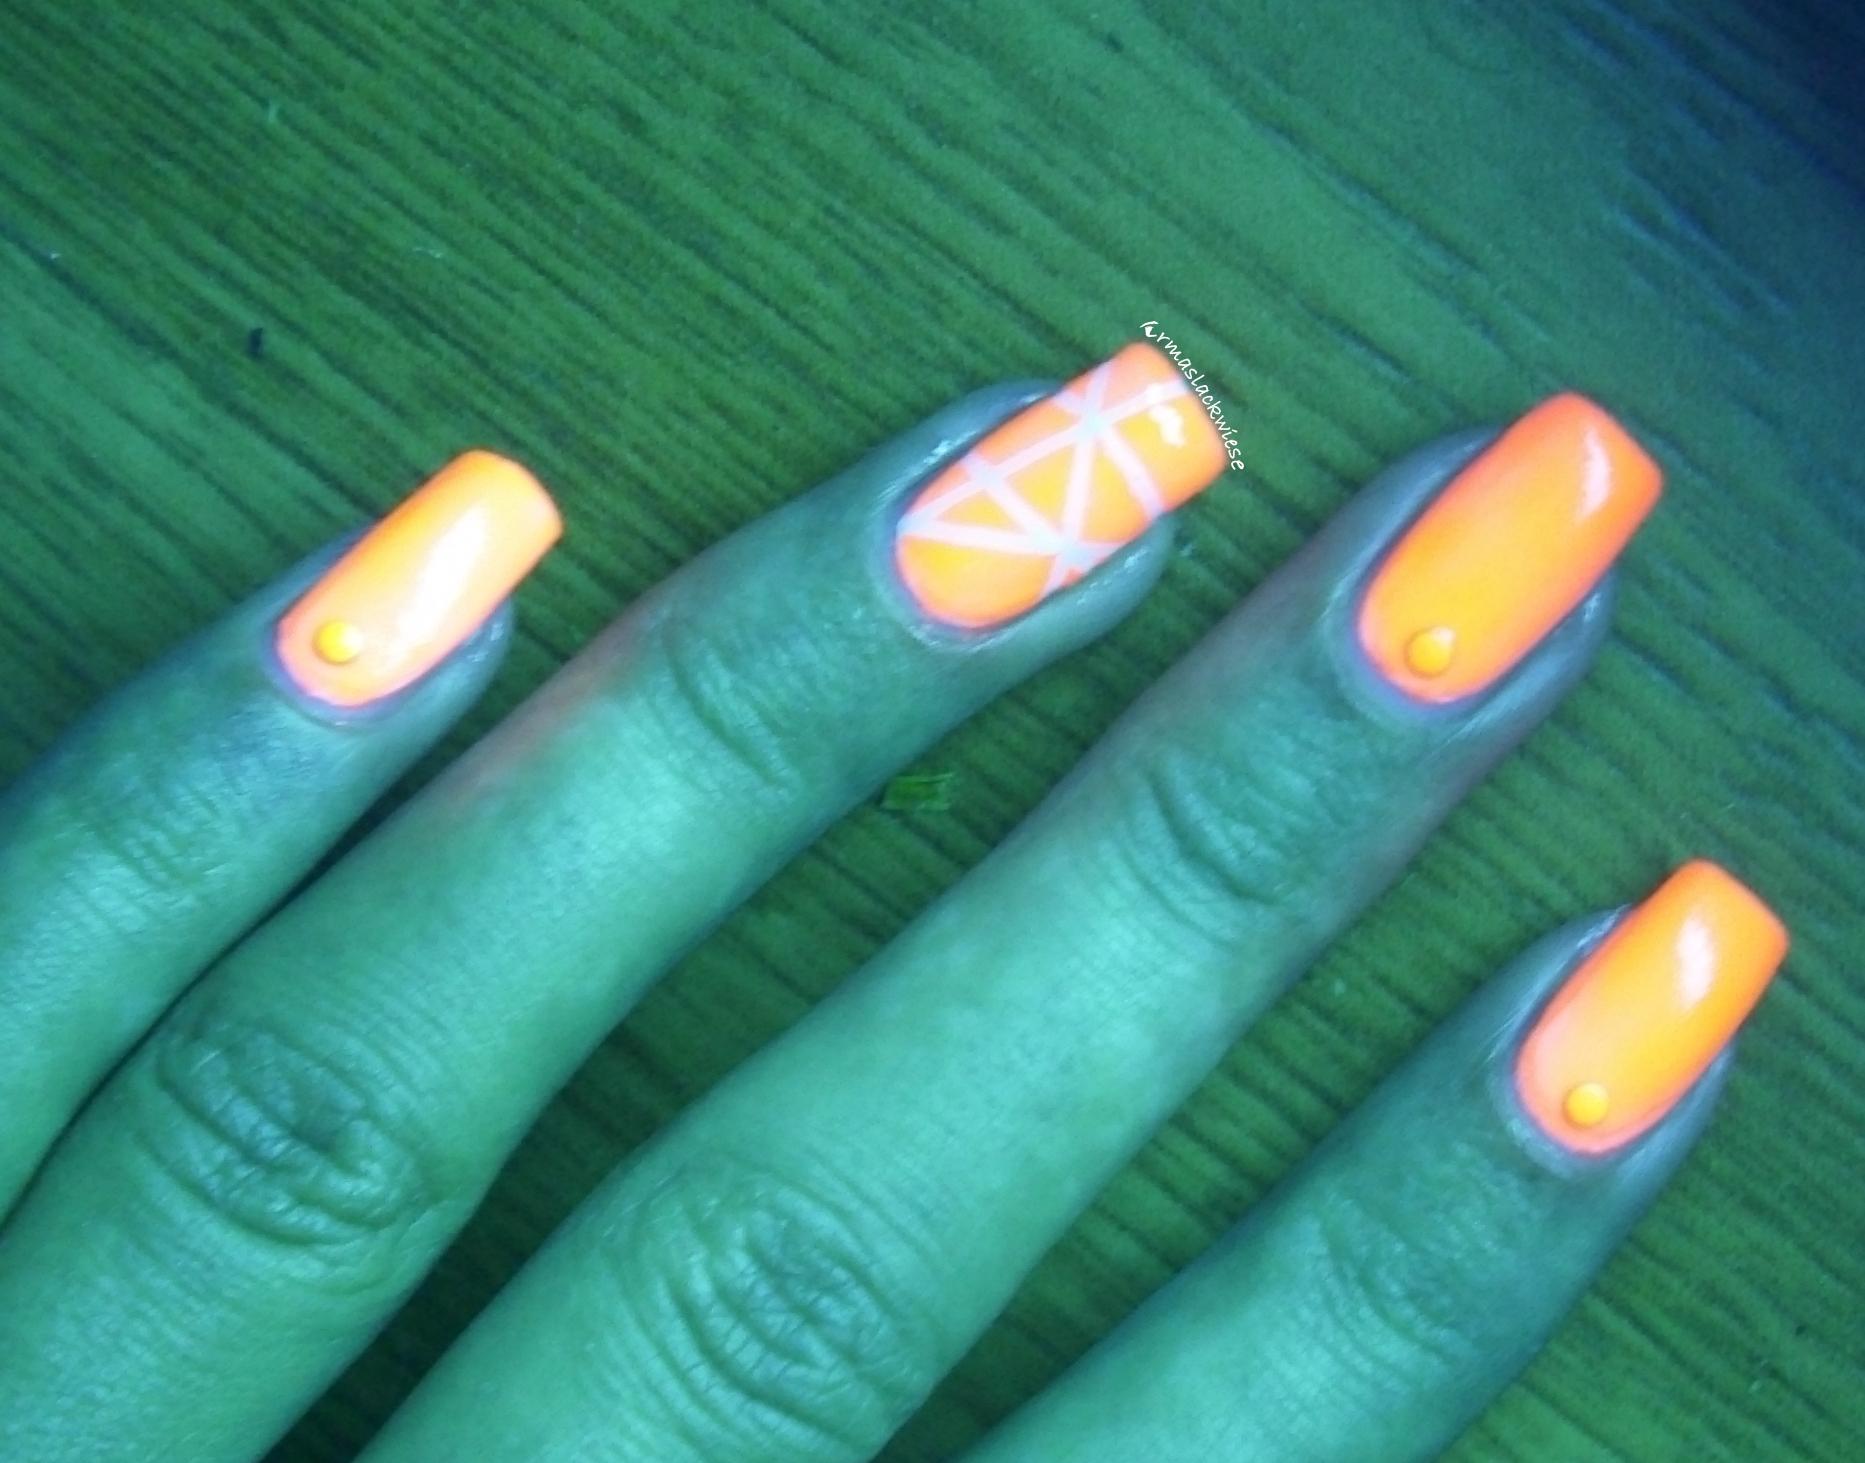 Neon Stripes – Leuchtlack vom Bornprettystore – Irmas Lackwiese